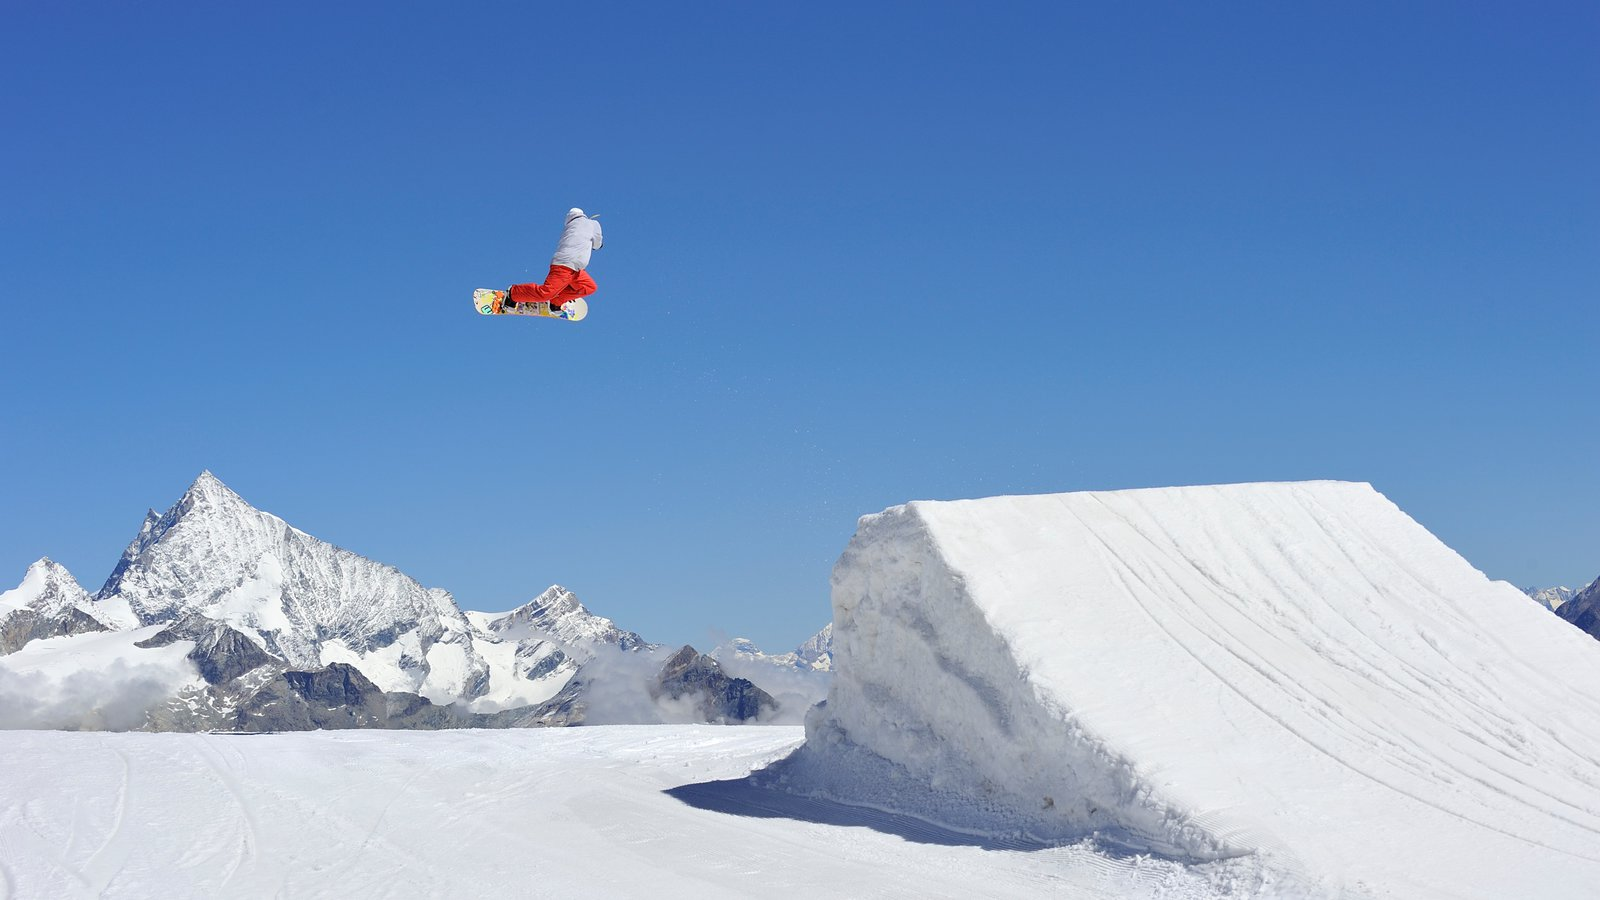 Matterhorn que incluye nieve y snowboard